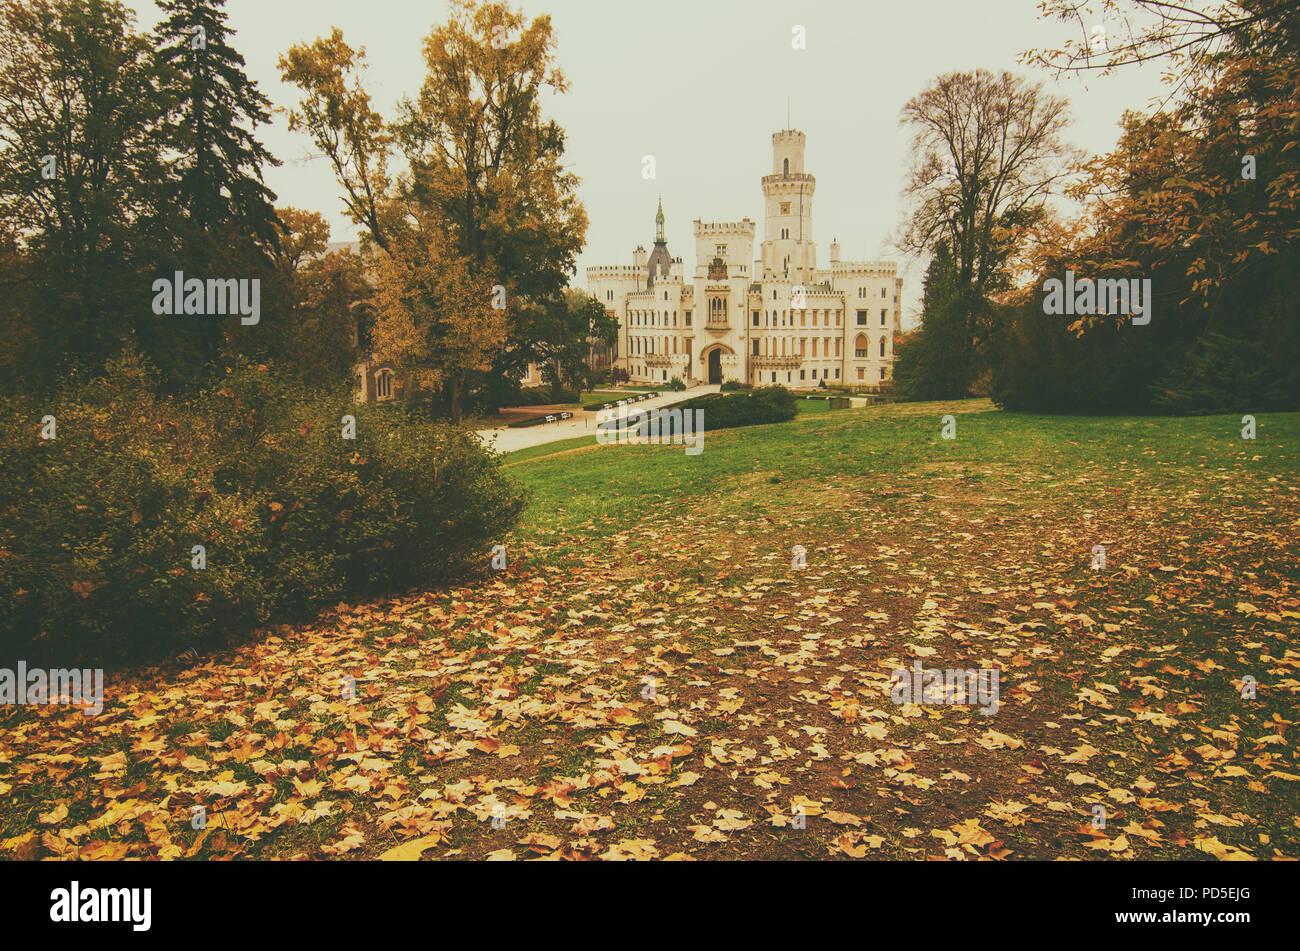 Famous Czech castle Hluboka nad Vltavou, medieval building with beautiful autumn park, travel outdoor european background - Stock Image